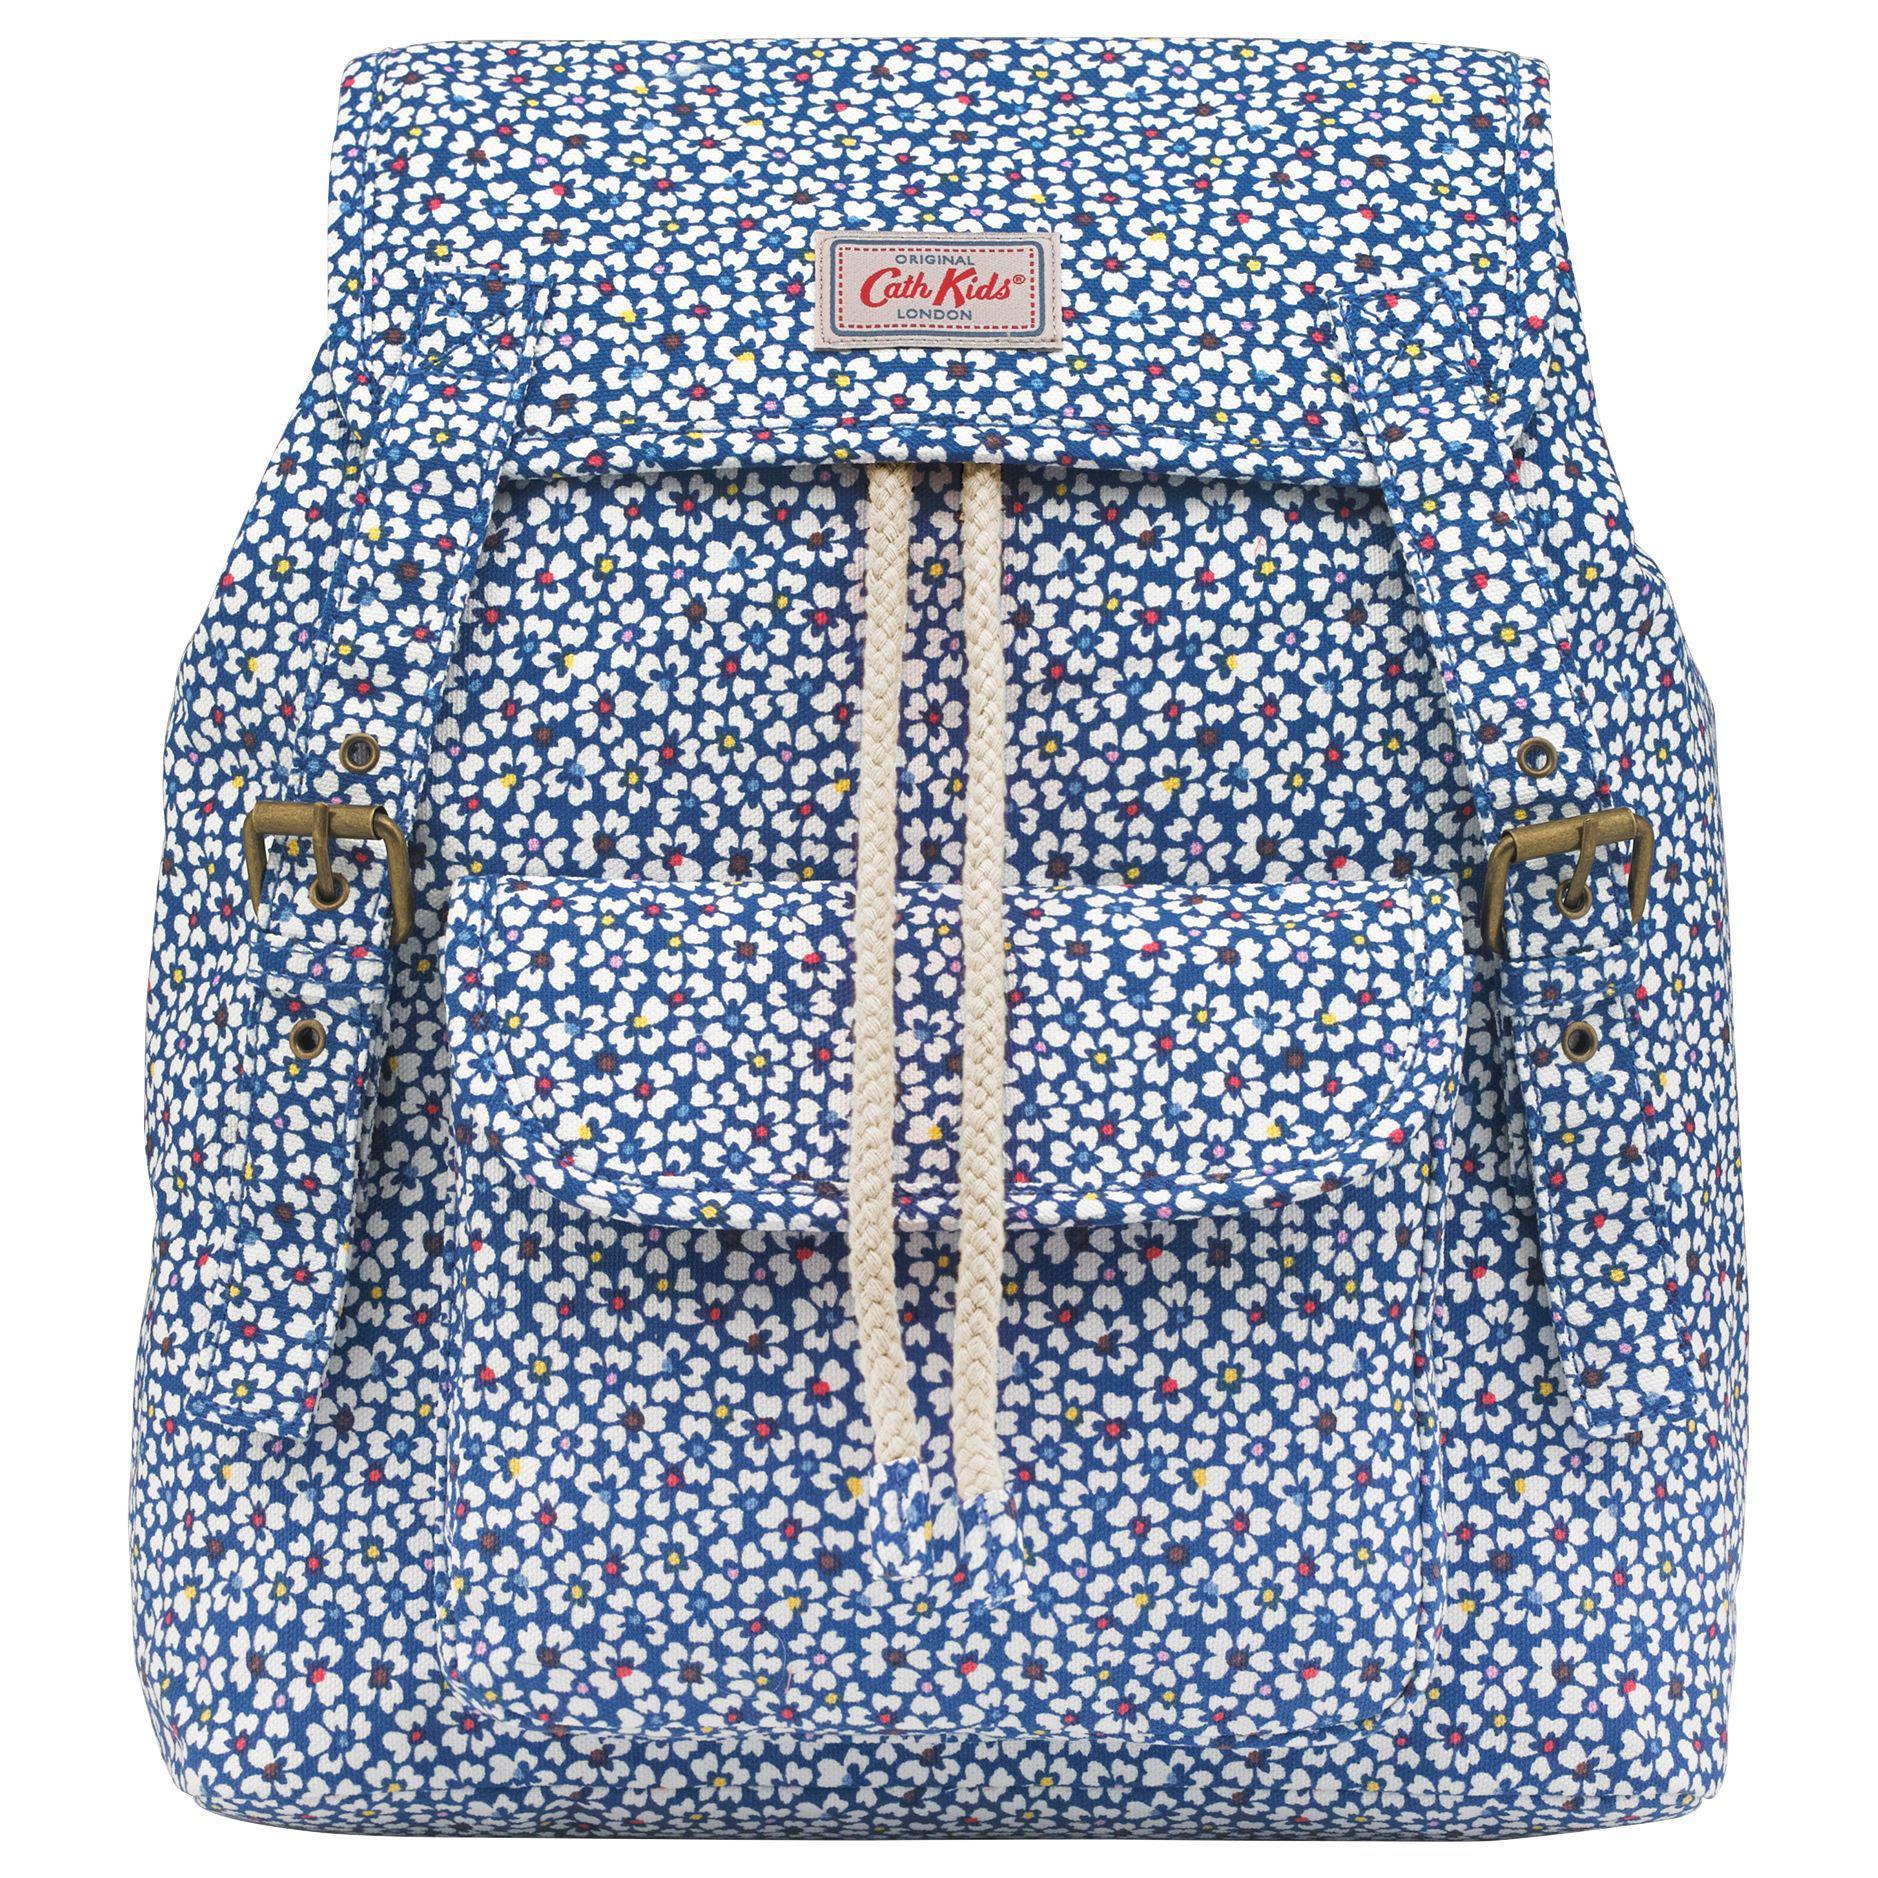 70f578e7a2 Cath Kidston Children's Friendship Flowers Junior Backpack in Blue ...